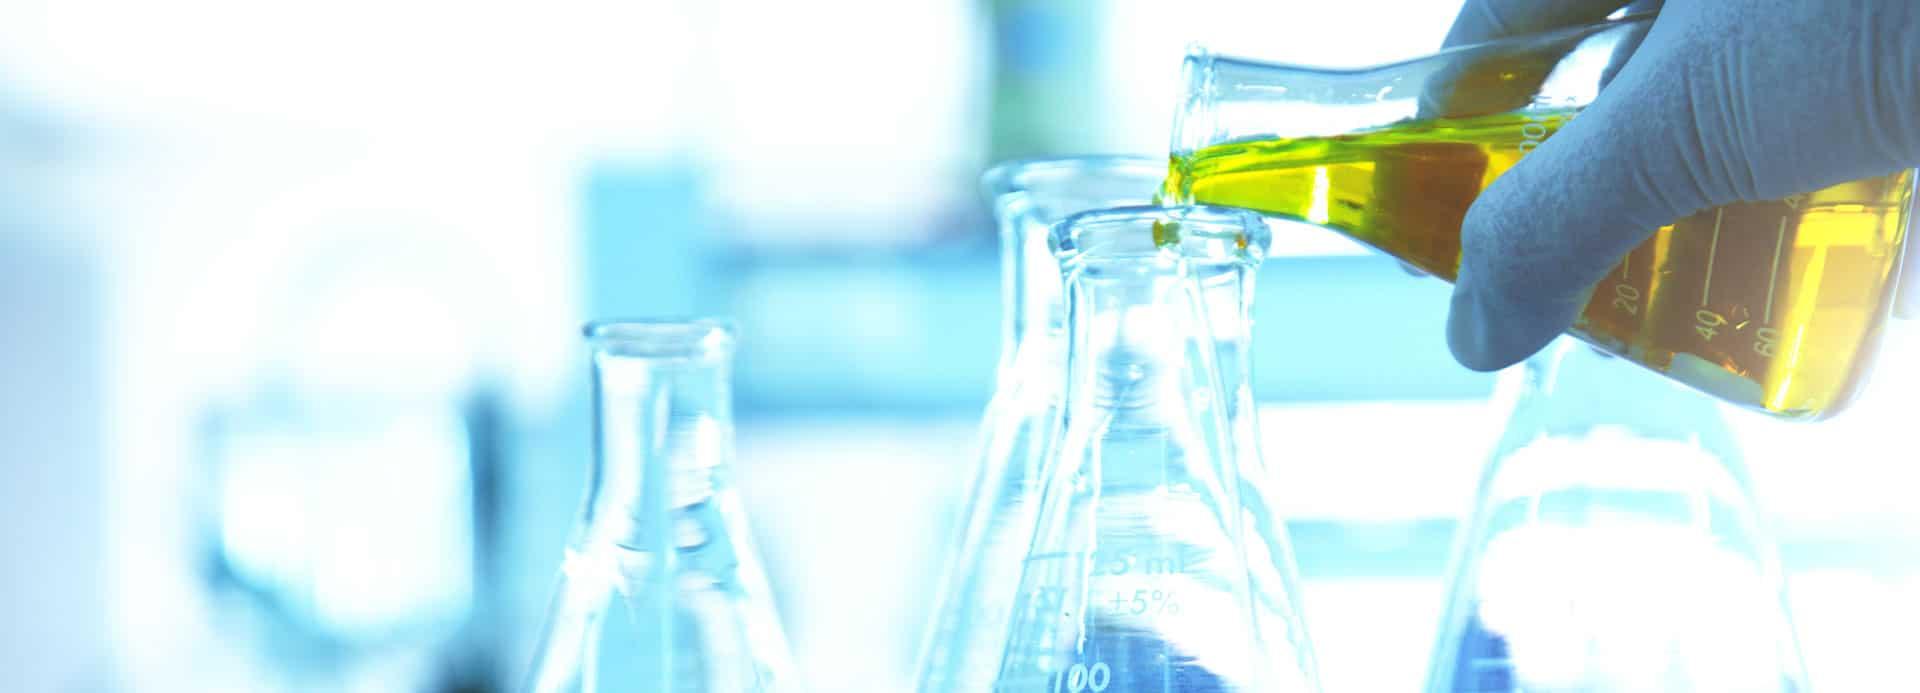 Chemist hand handling chemicals